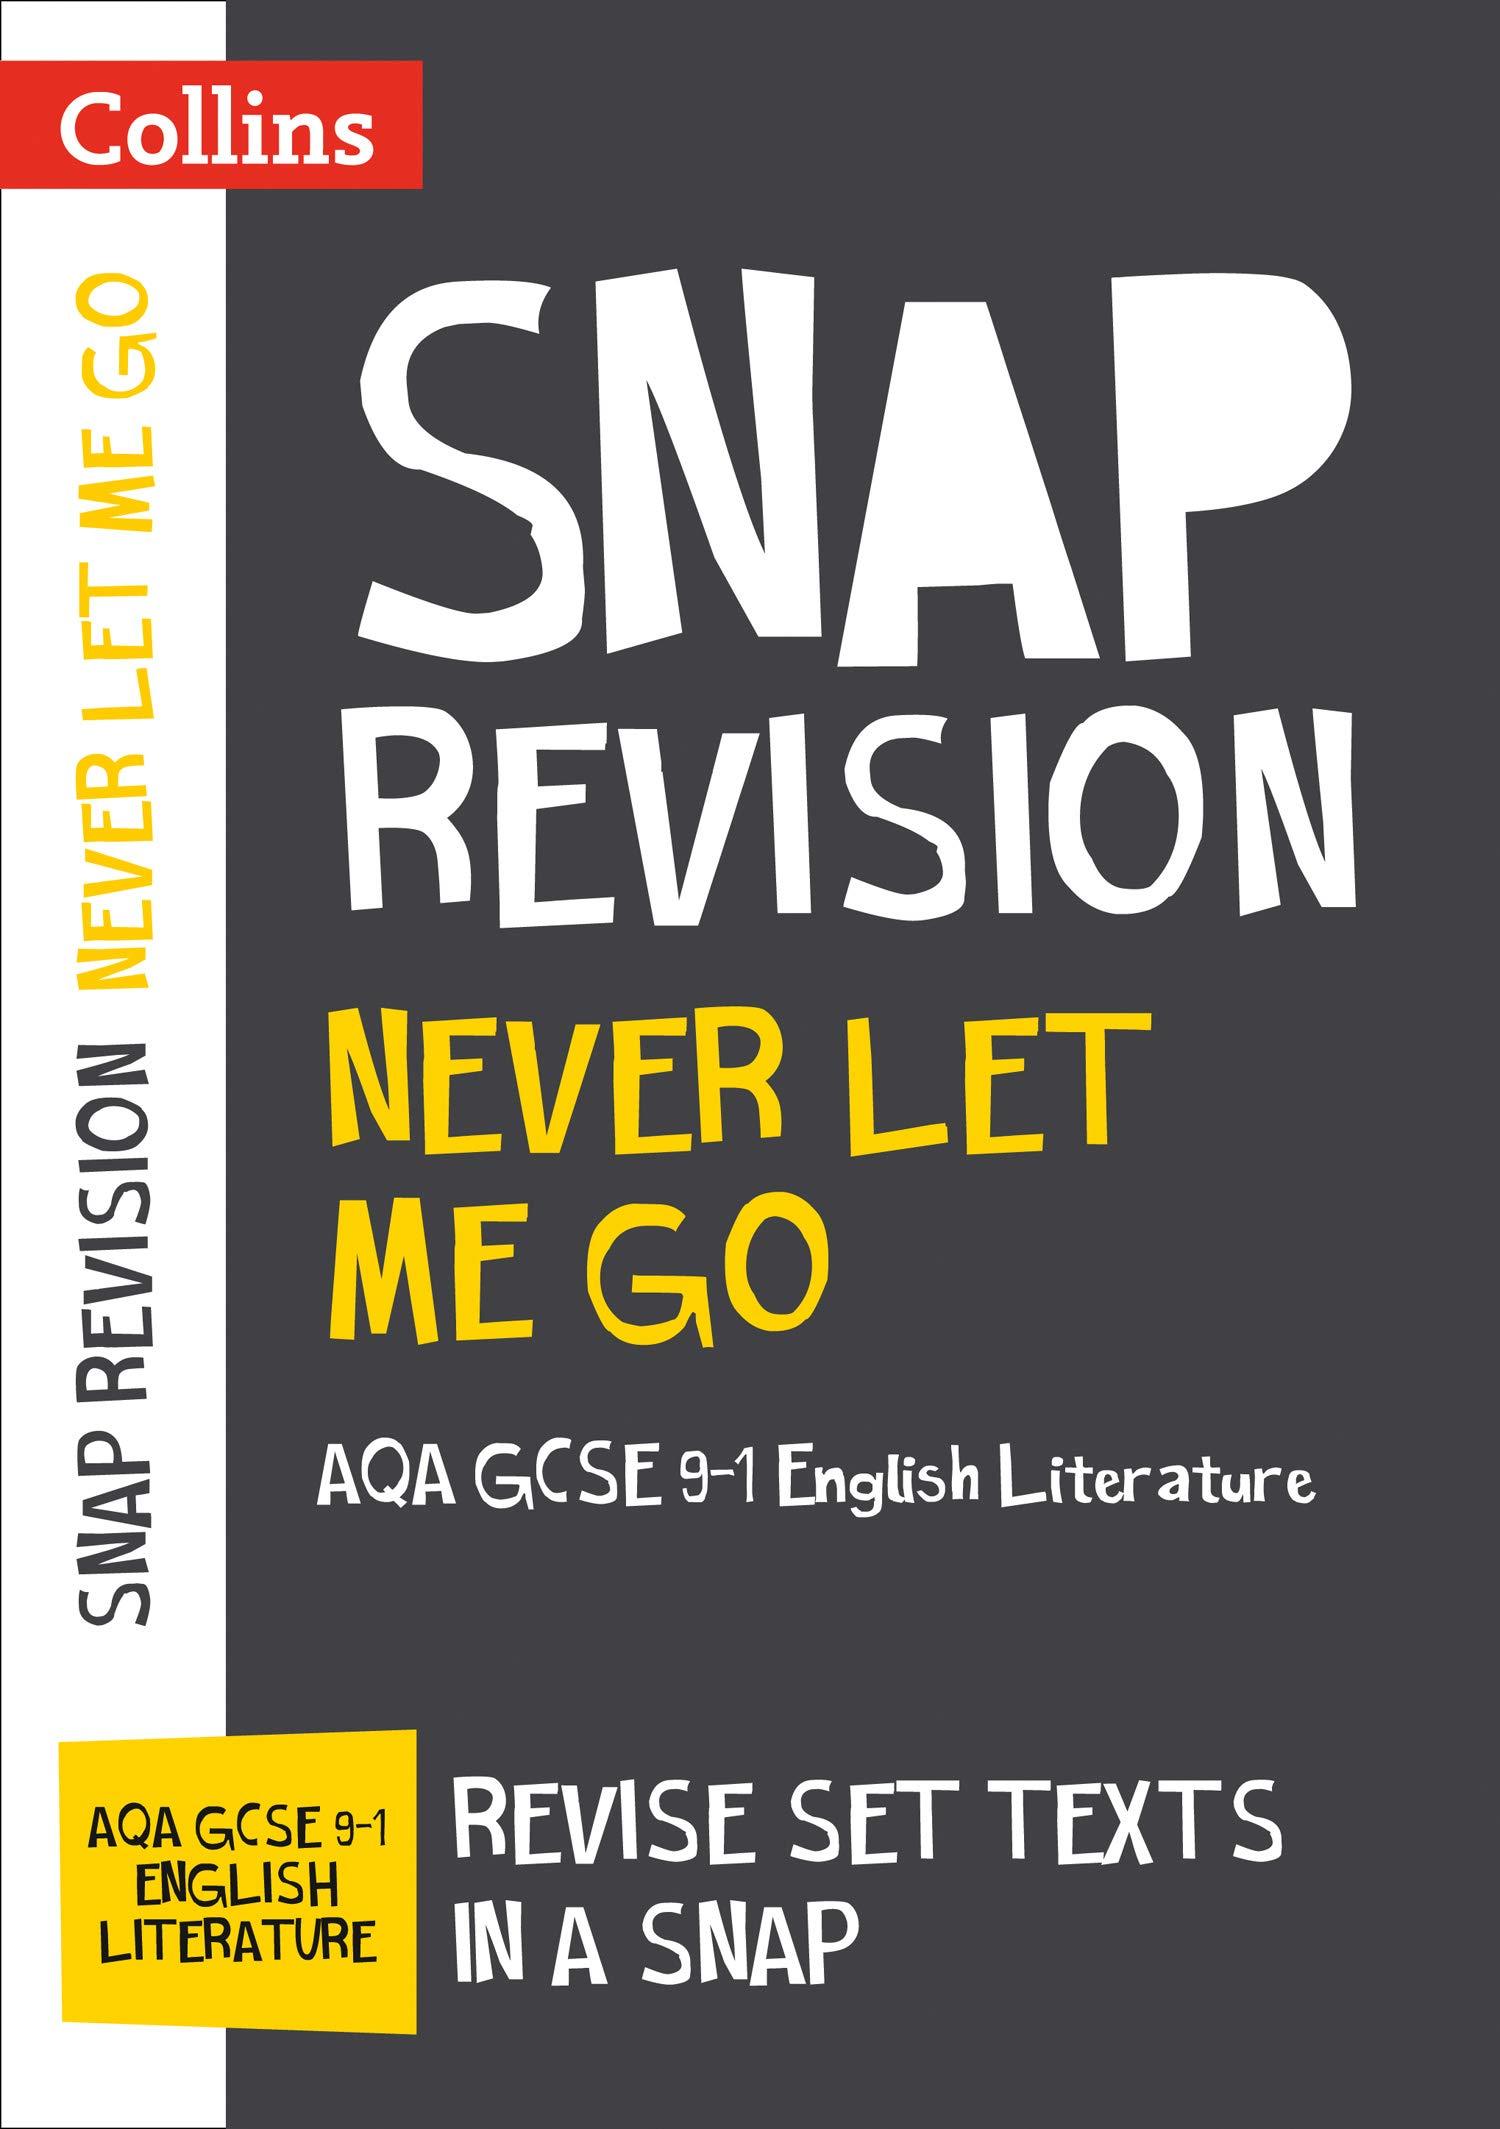 Never Let Me Go: New Grade 9-1 GCSE English Literature AQA Text Guide (Collins GCSE 9-1 Snap Revision)